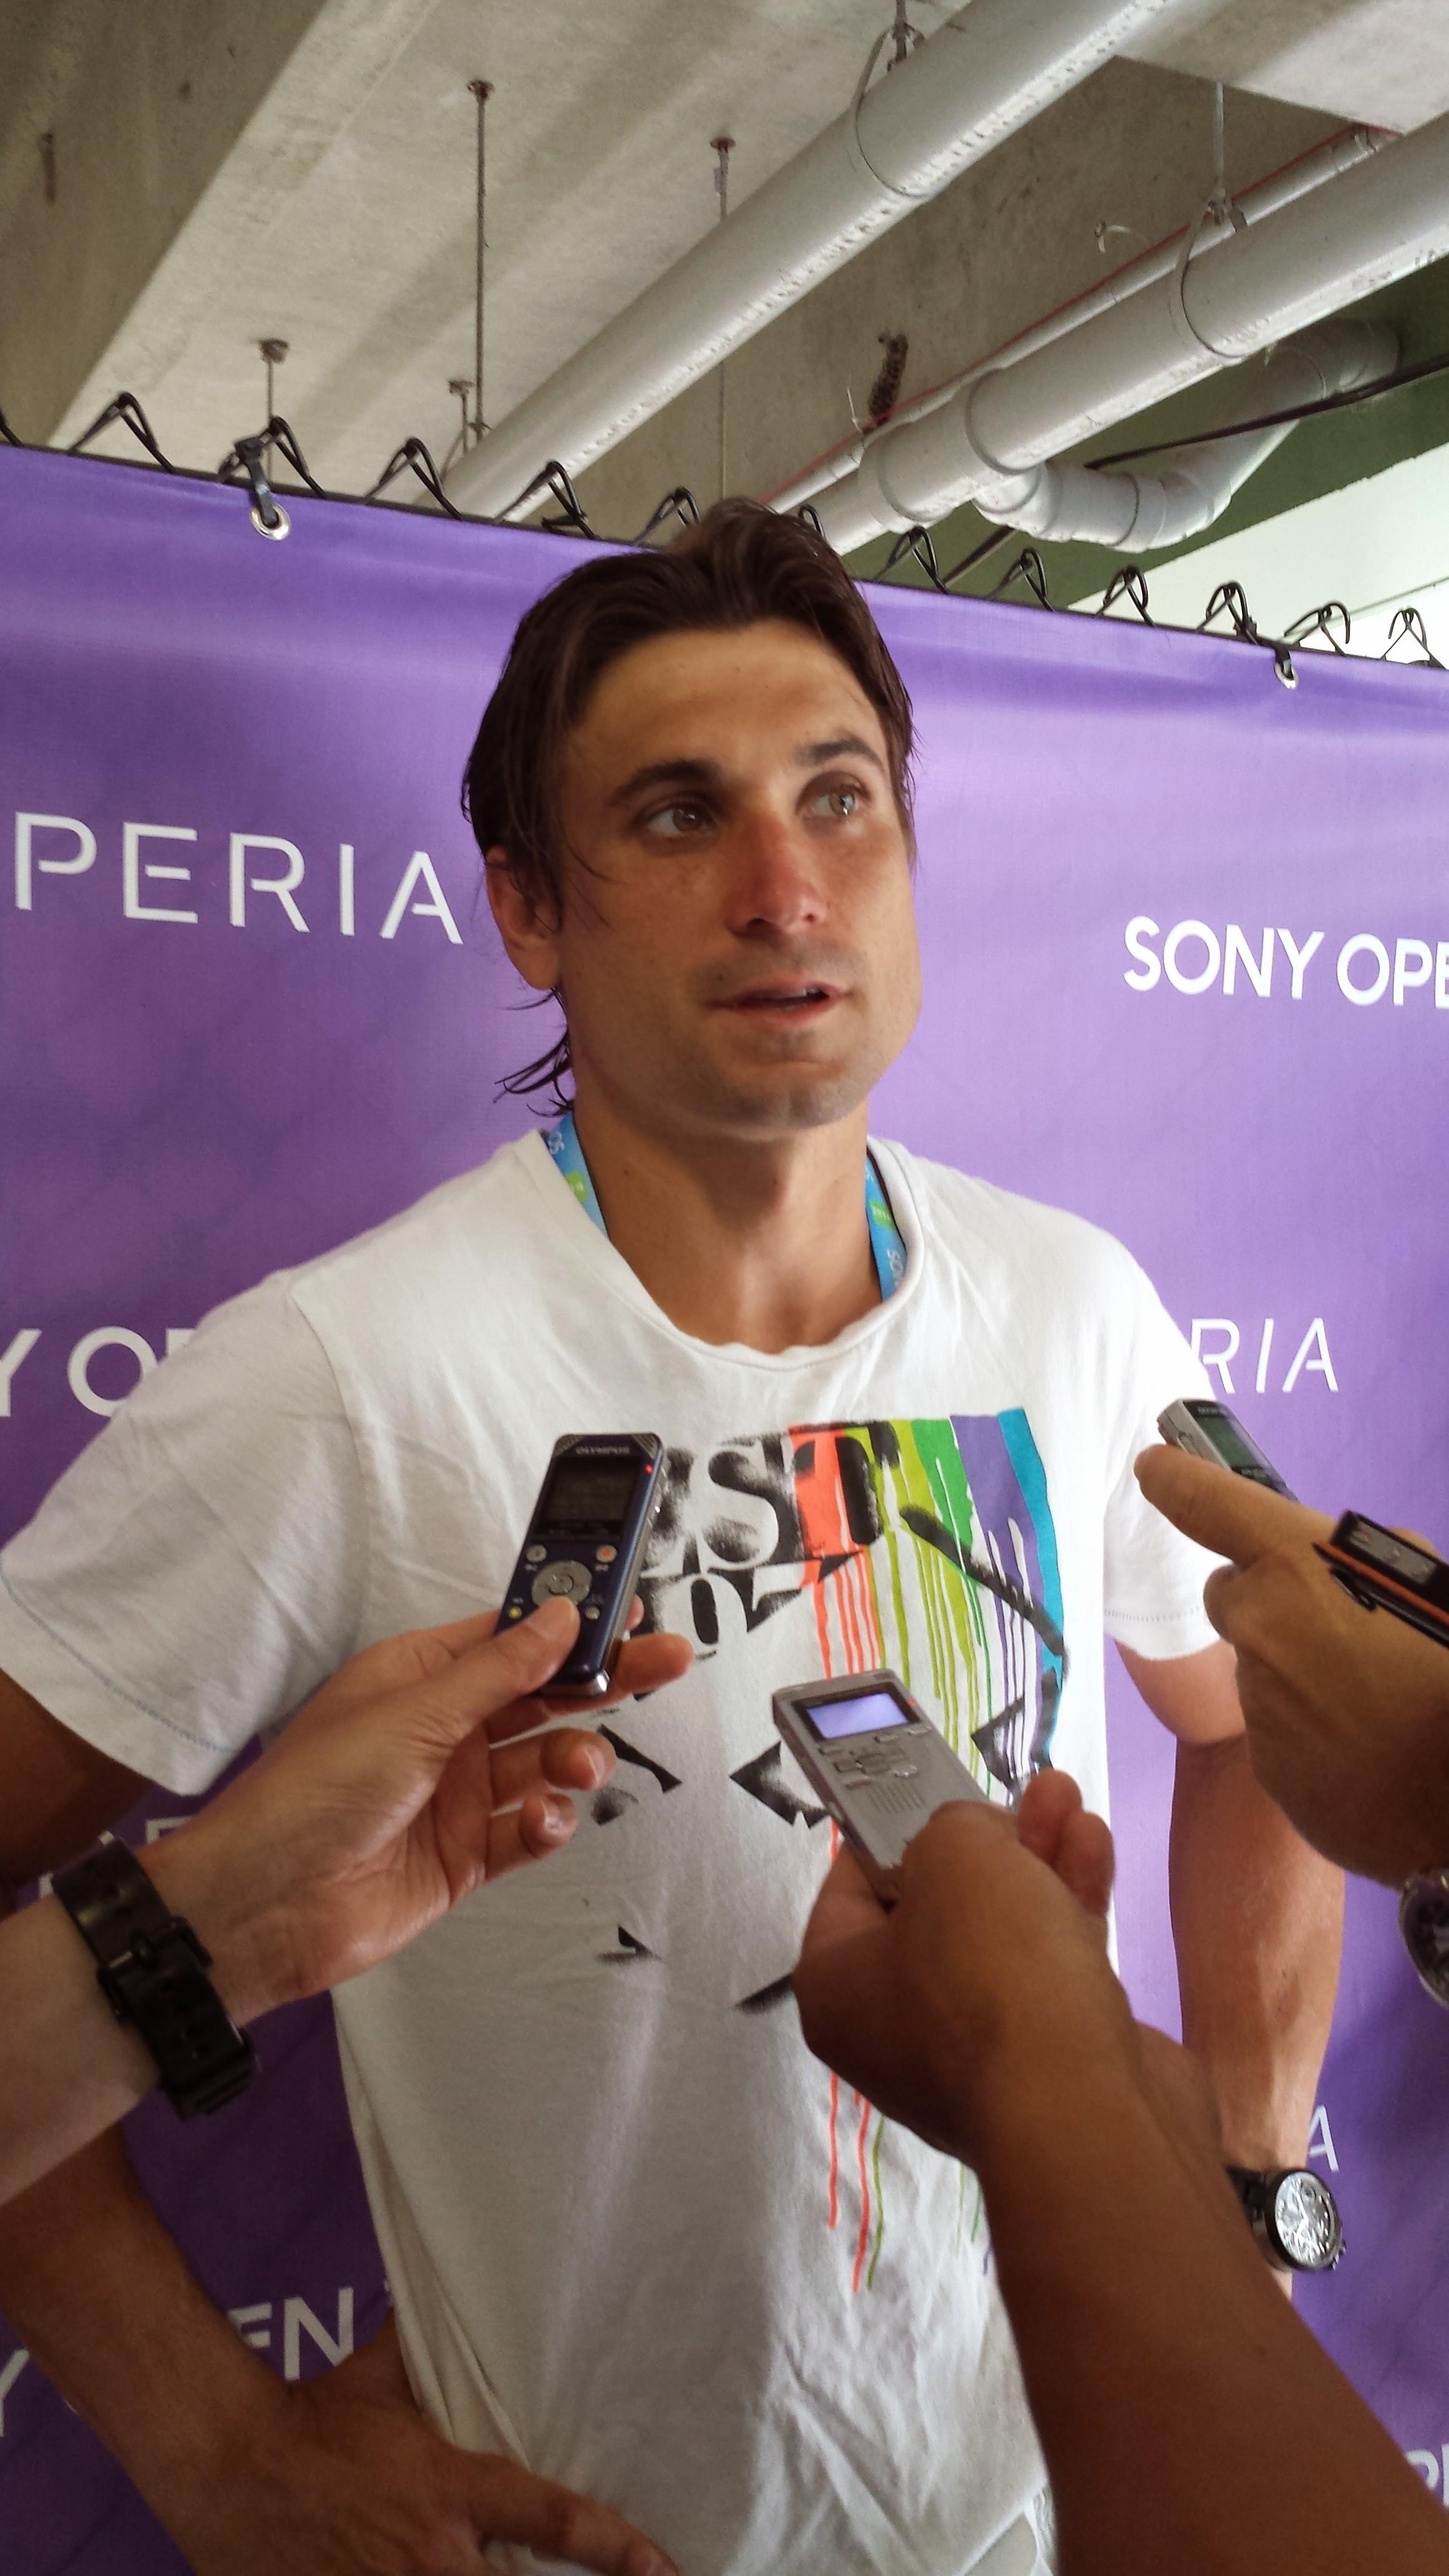 Ferrer at Sony Open '14